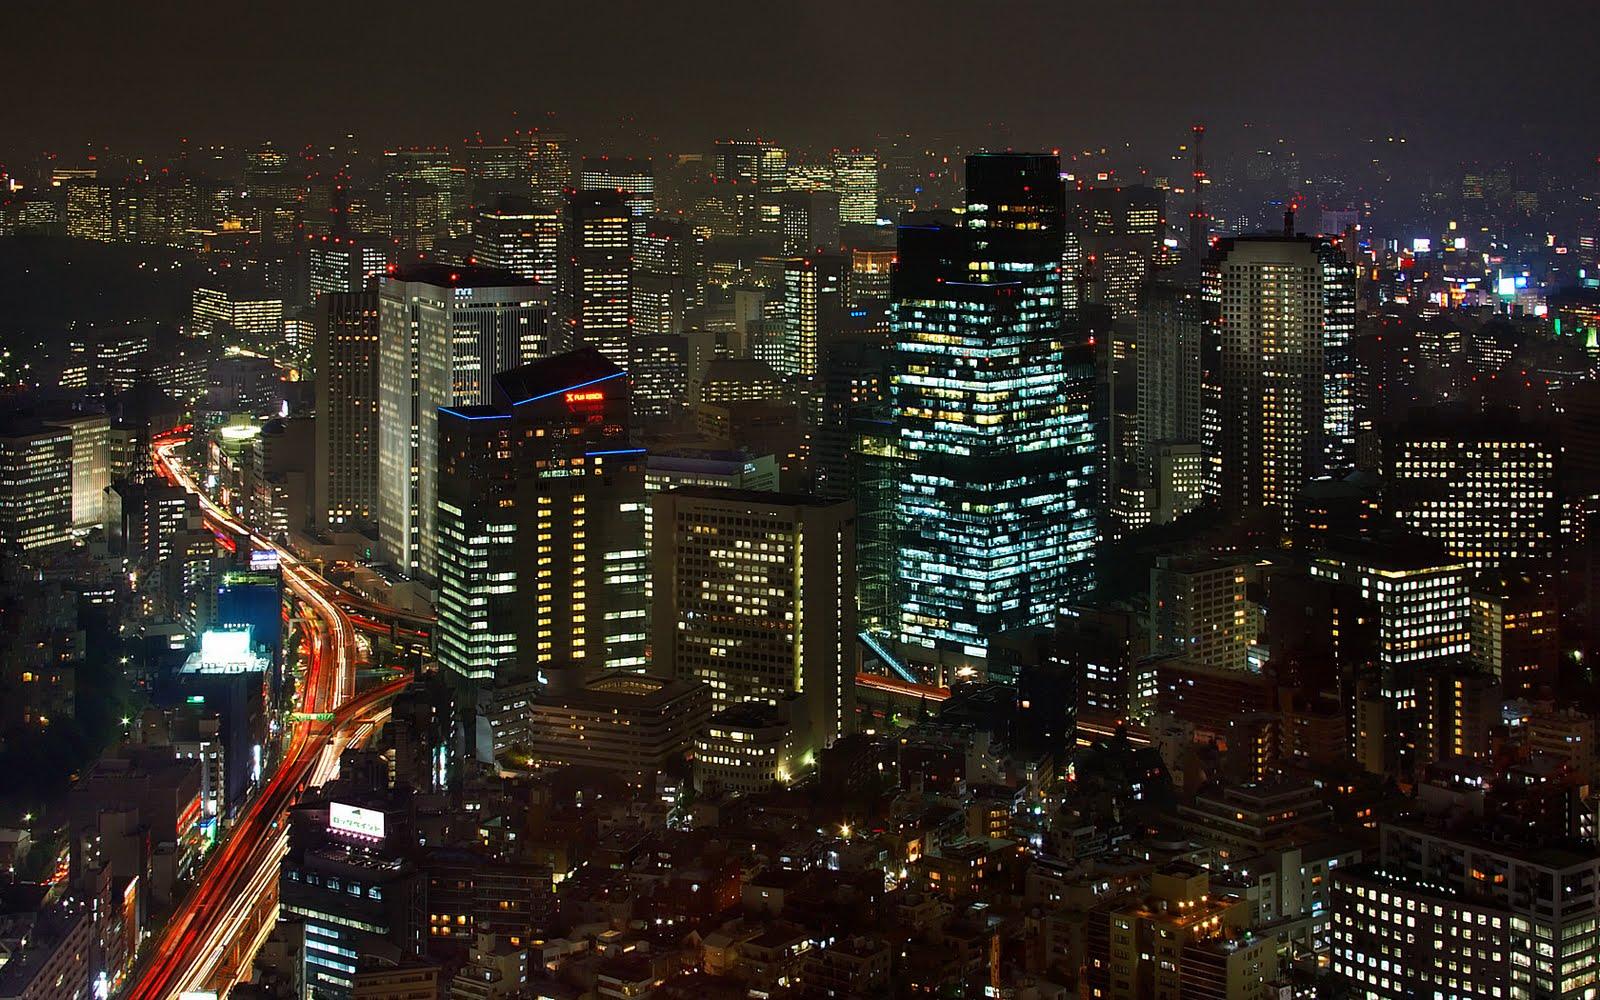 Tokyo at Night Wallpaper 1600x1000